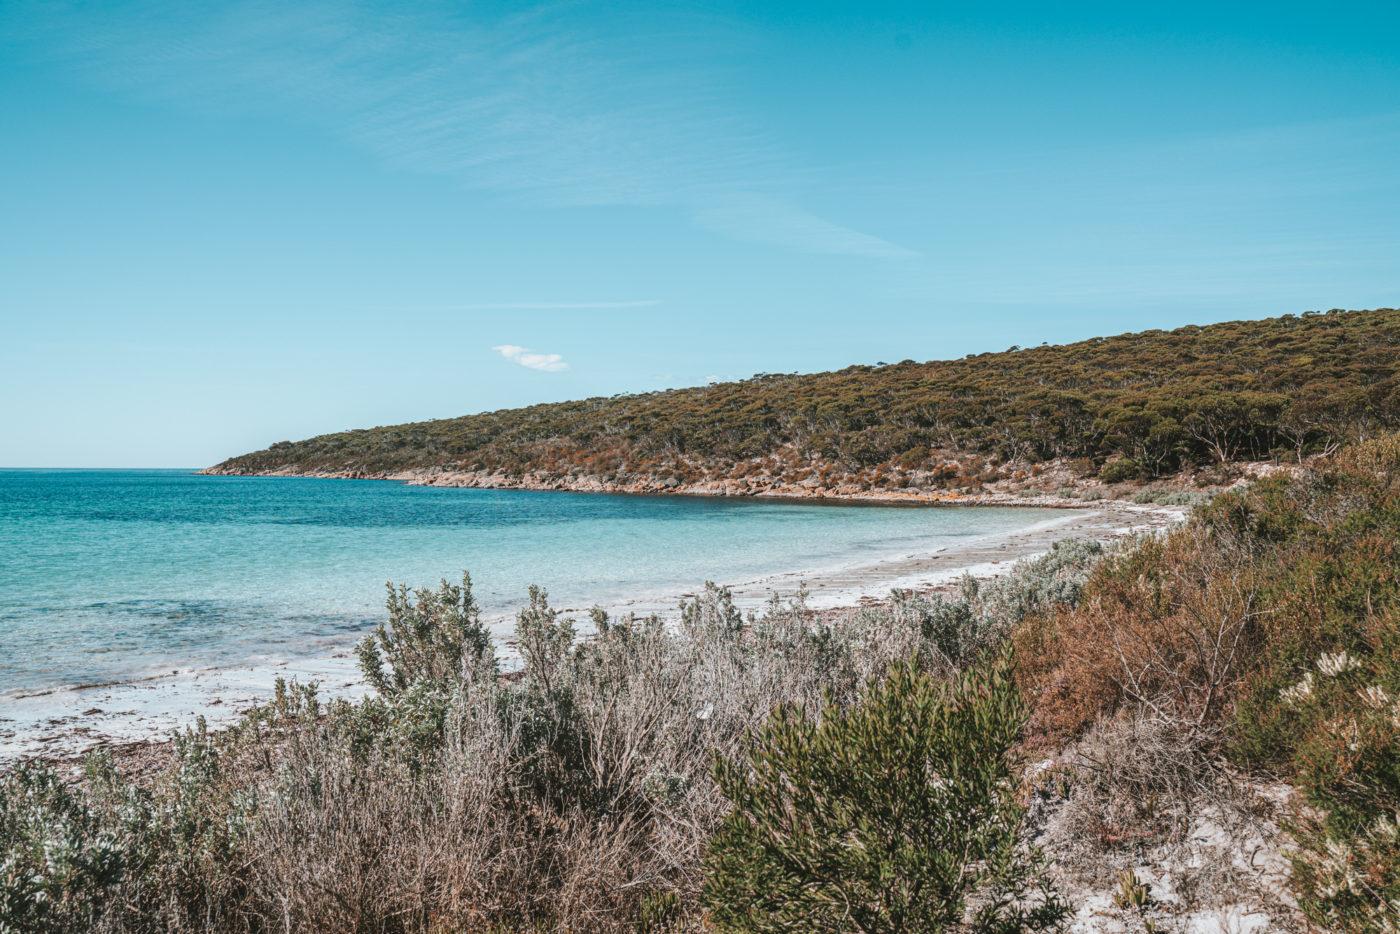 Memory Cove, Port Lincoln National Park, Eyre Peninsula